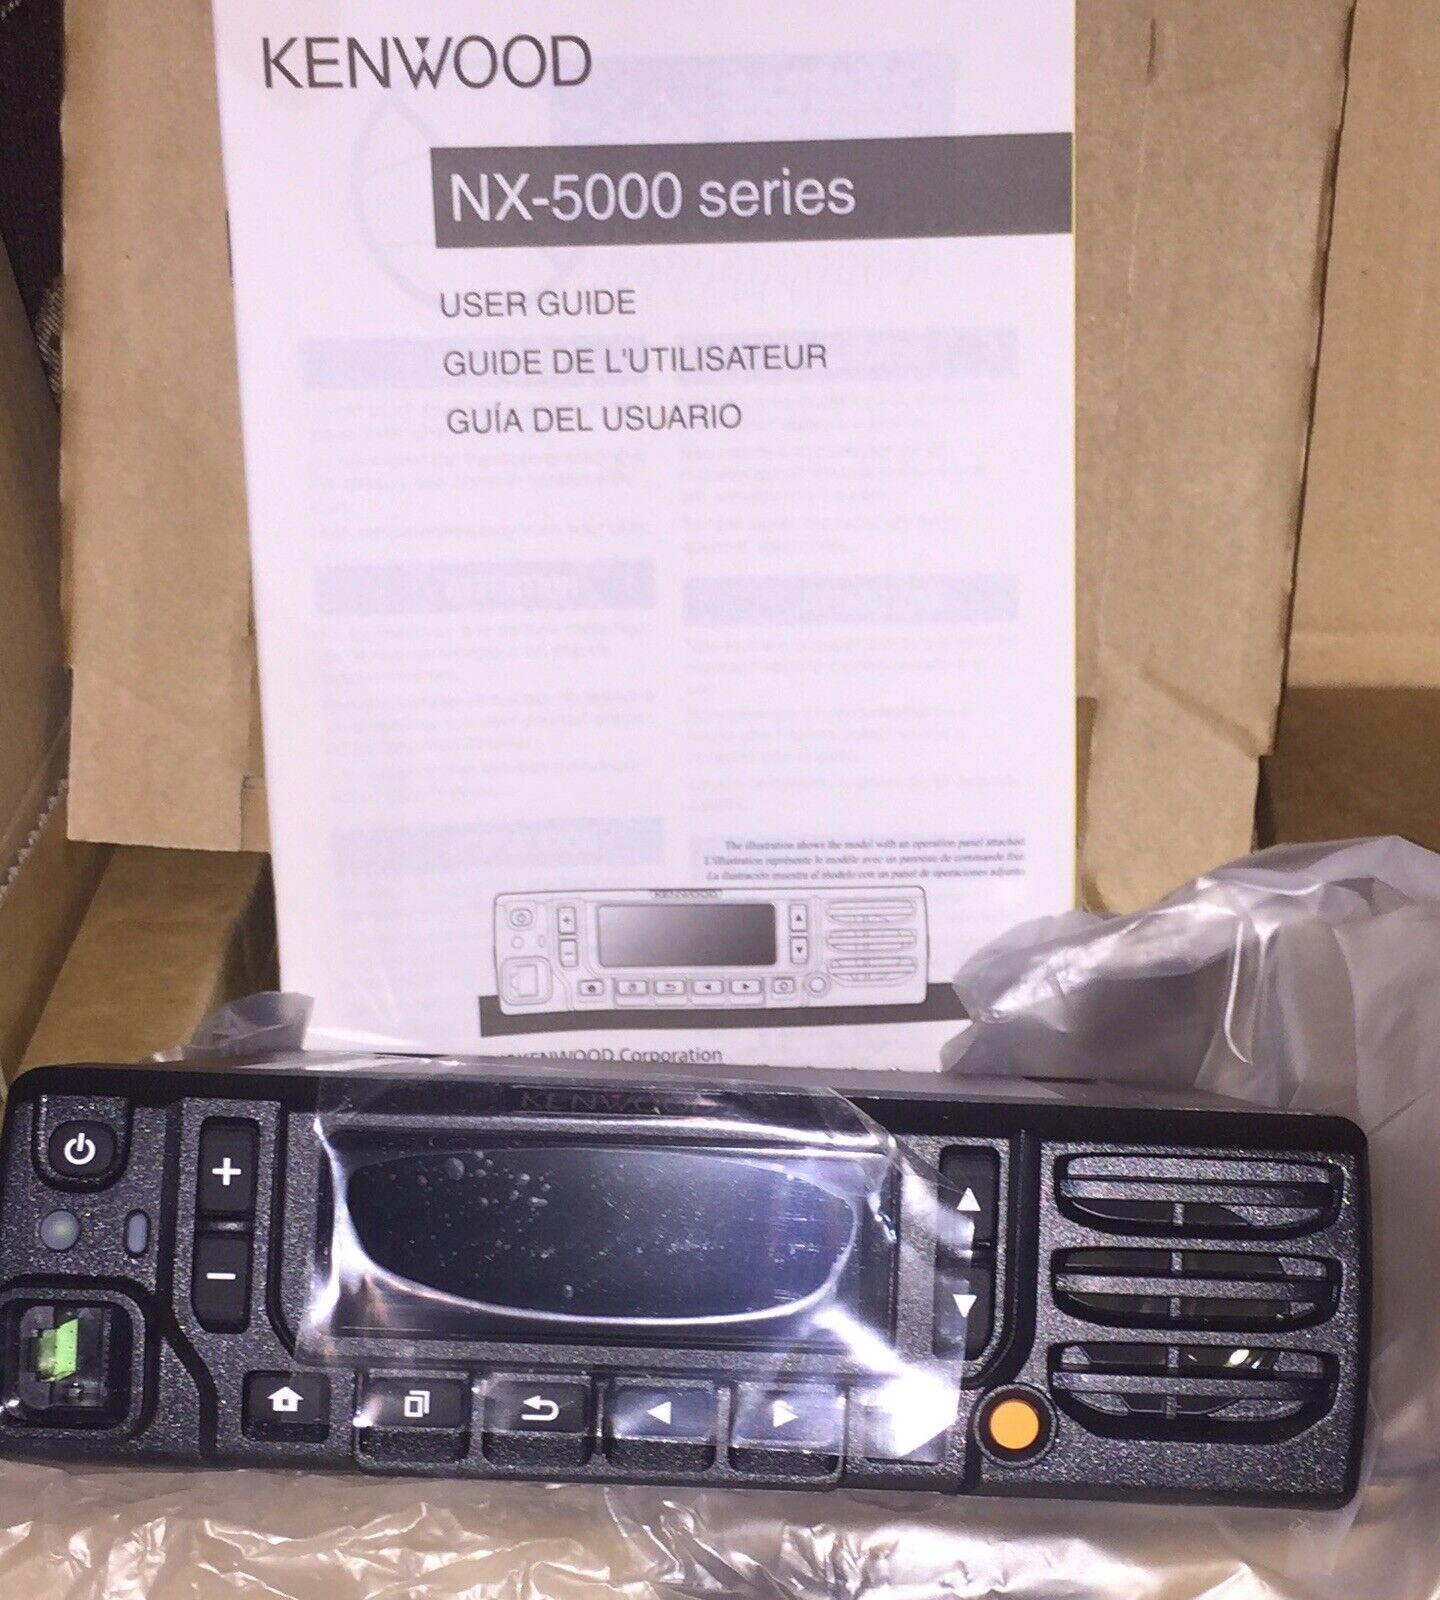 Kenwood Nx-5800k NXDN DIGITAL UHF 450-520 MHz 45 Watts. Buy it now for 559.99